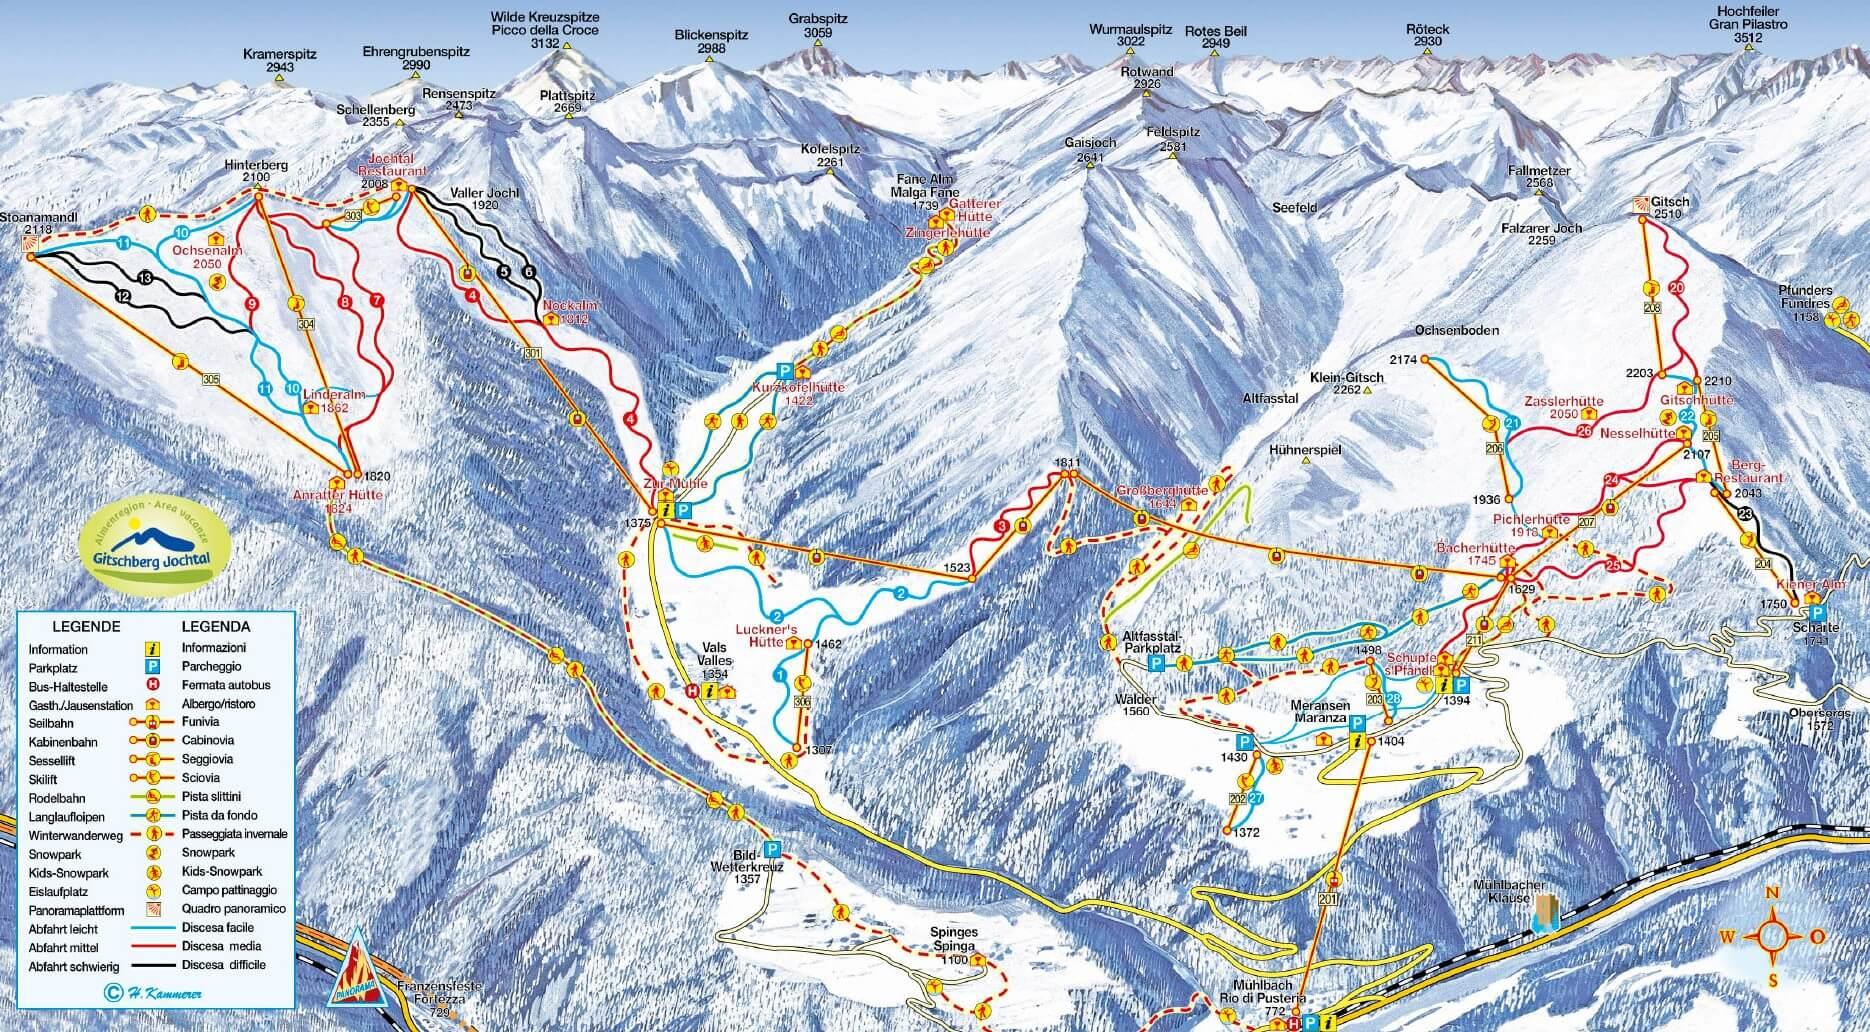 Ski resort Rio di Pusteria Slopes TopSkiResortcom